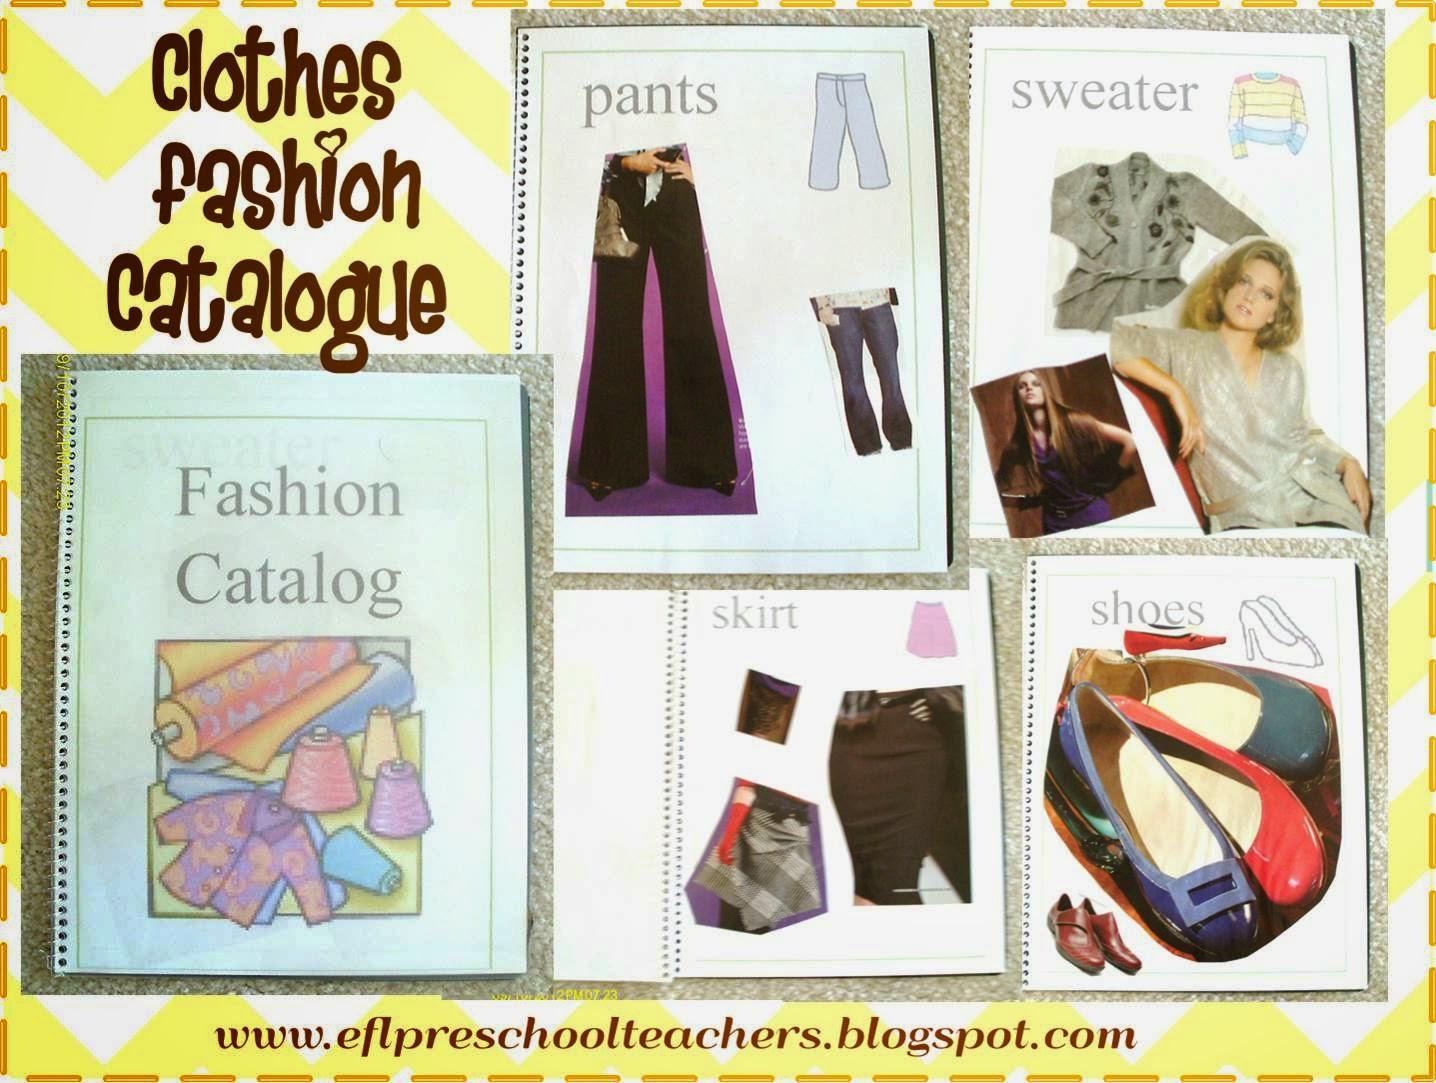 Esl Efl Preschool Teachers Clothes Theme For Preschool Ell